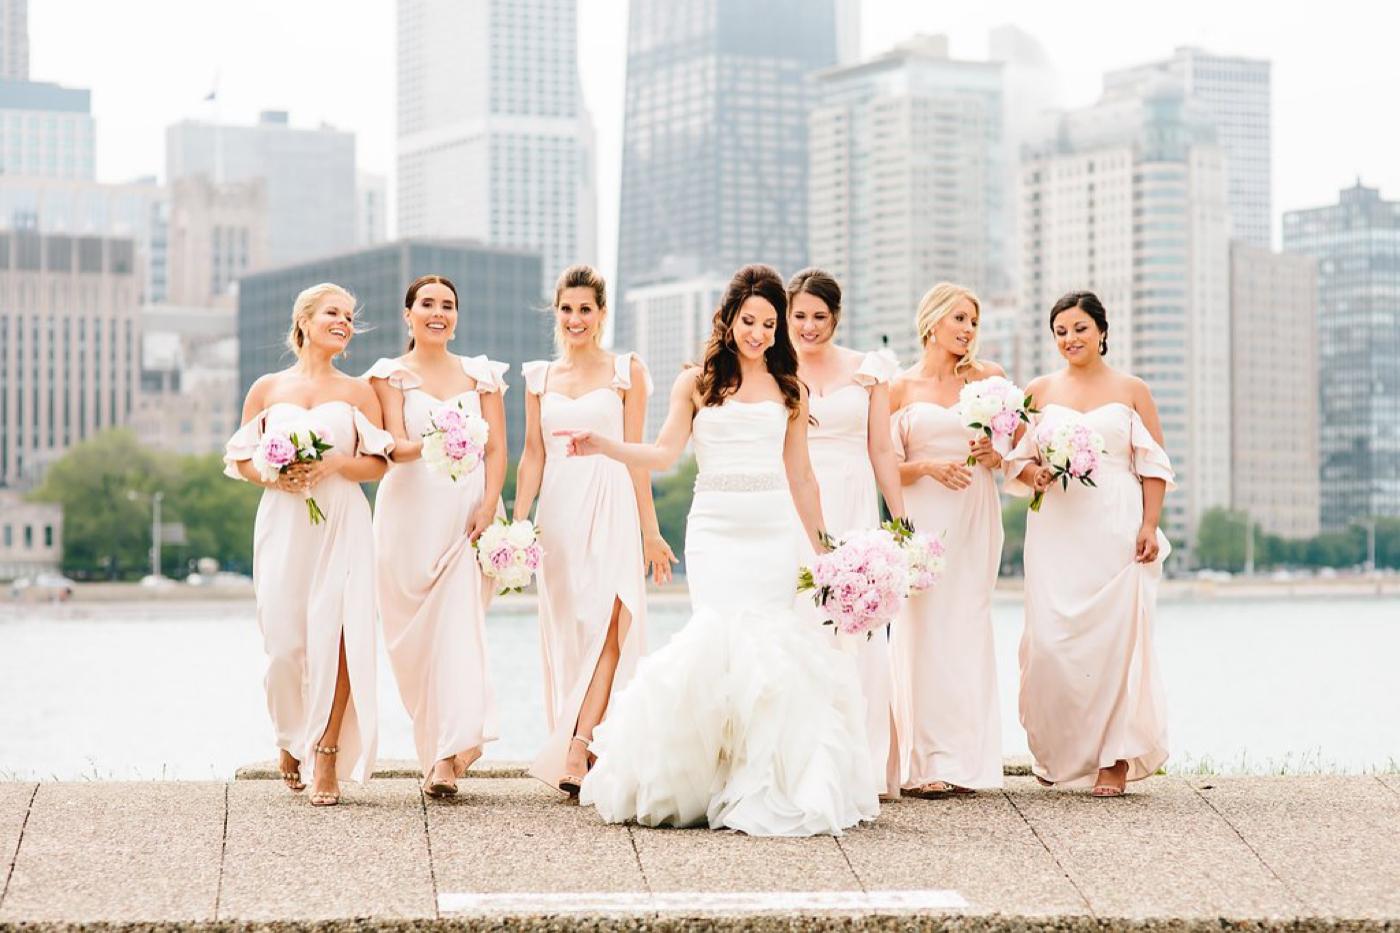 chicago-fine-art-wedding-photography-sakamuri32